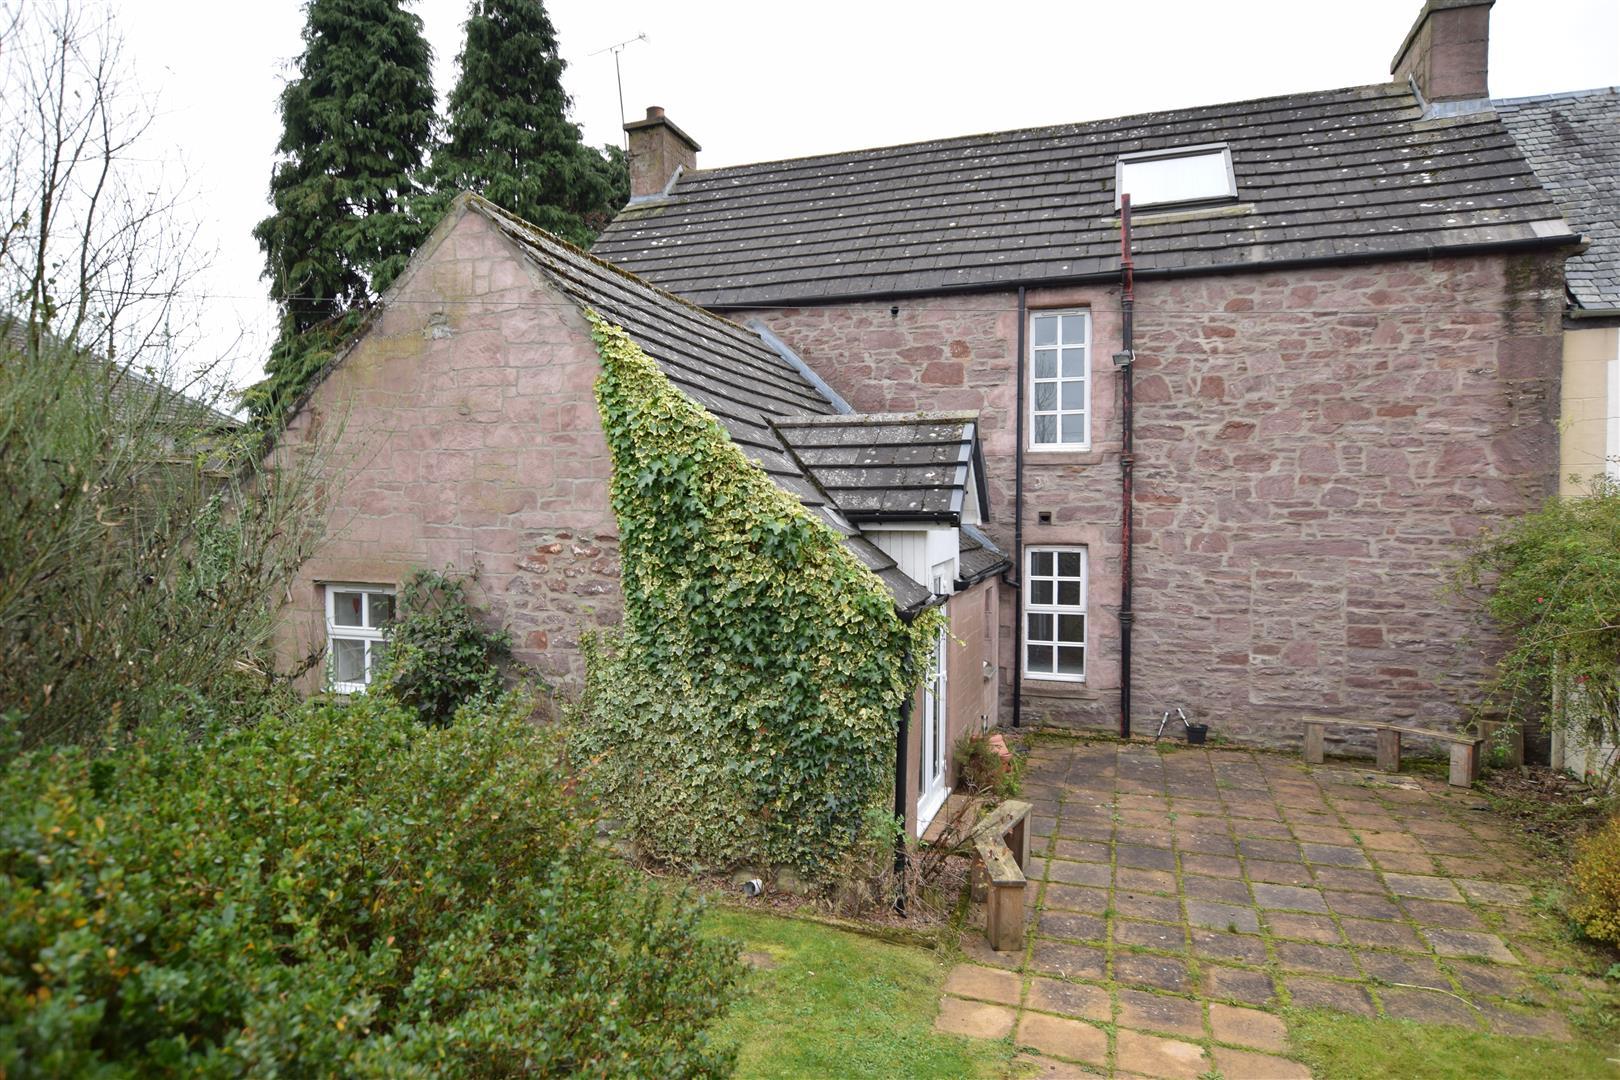 Strathallan House, Stirling Street, Blackford, Auchterarder, Perthshire, PH4 1QA, UK